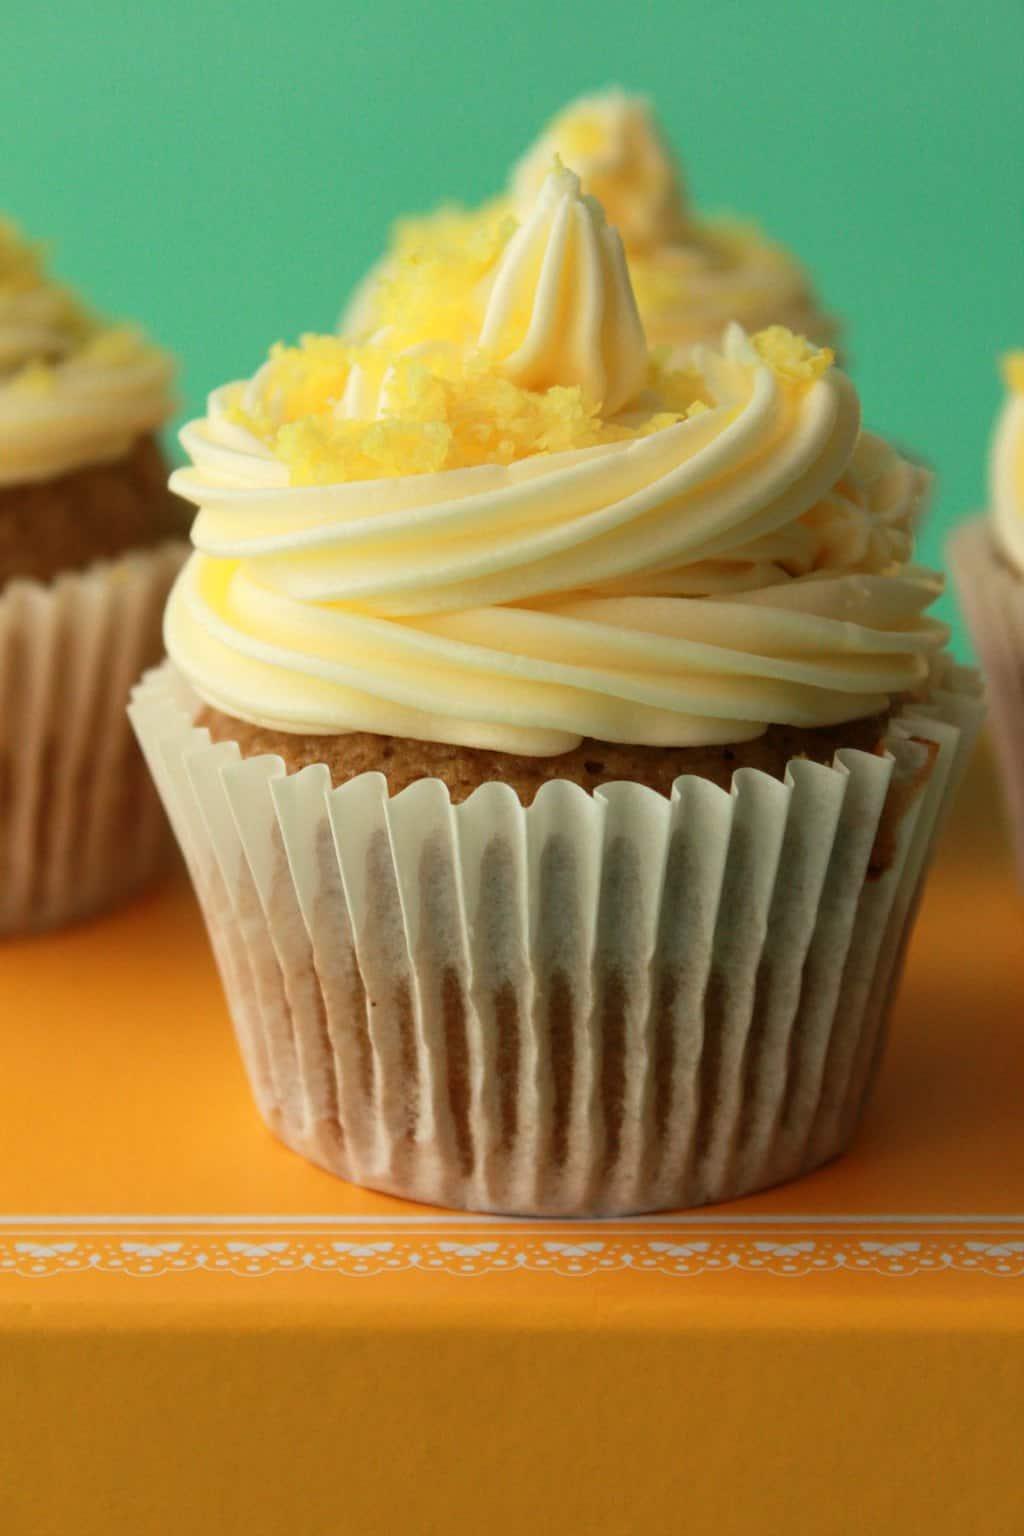 Vegan lemon cupcakes topped with lemon frosting and lemon zest.